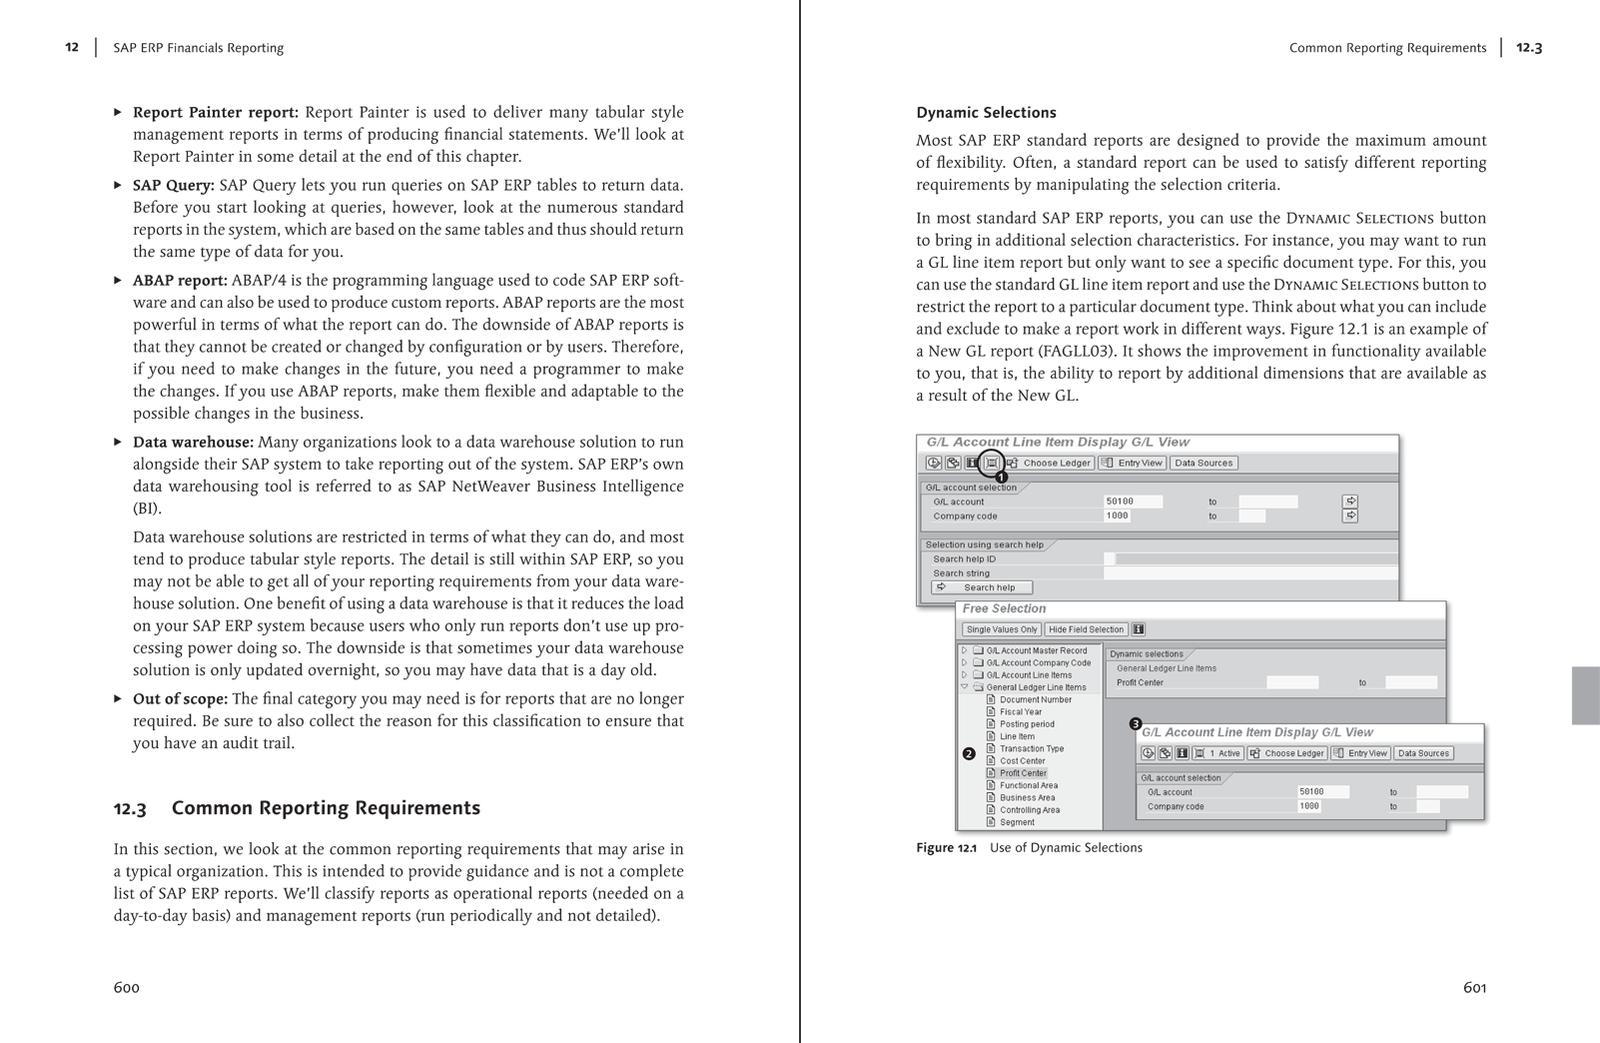 SAP ERP Financials: Configuration and Design